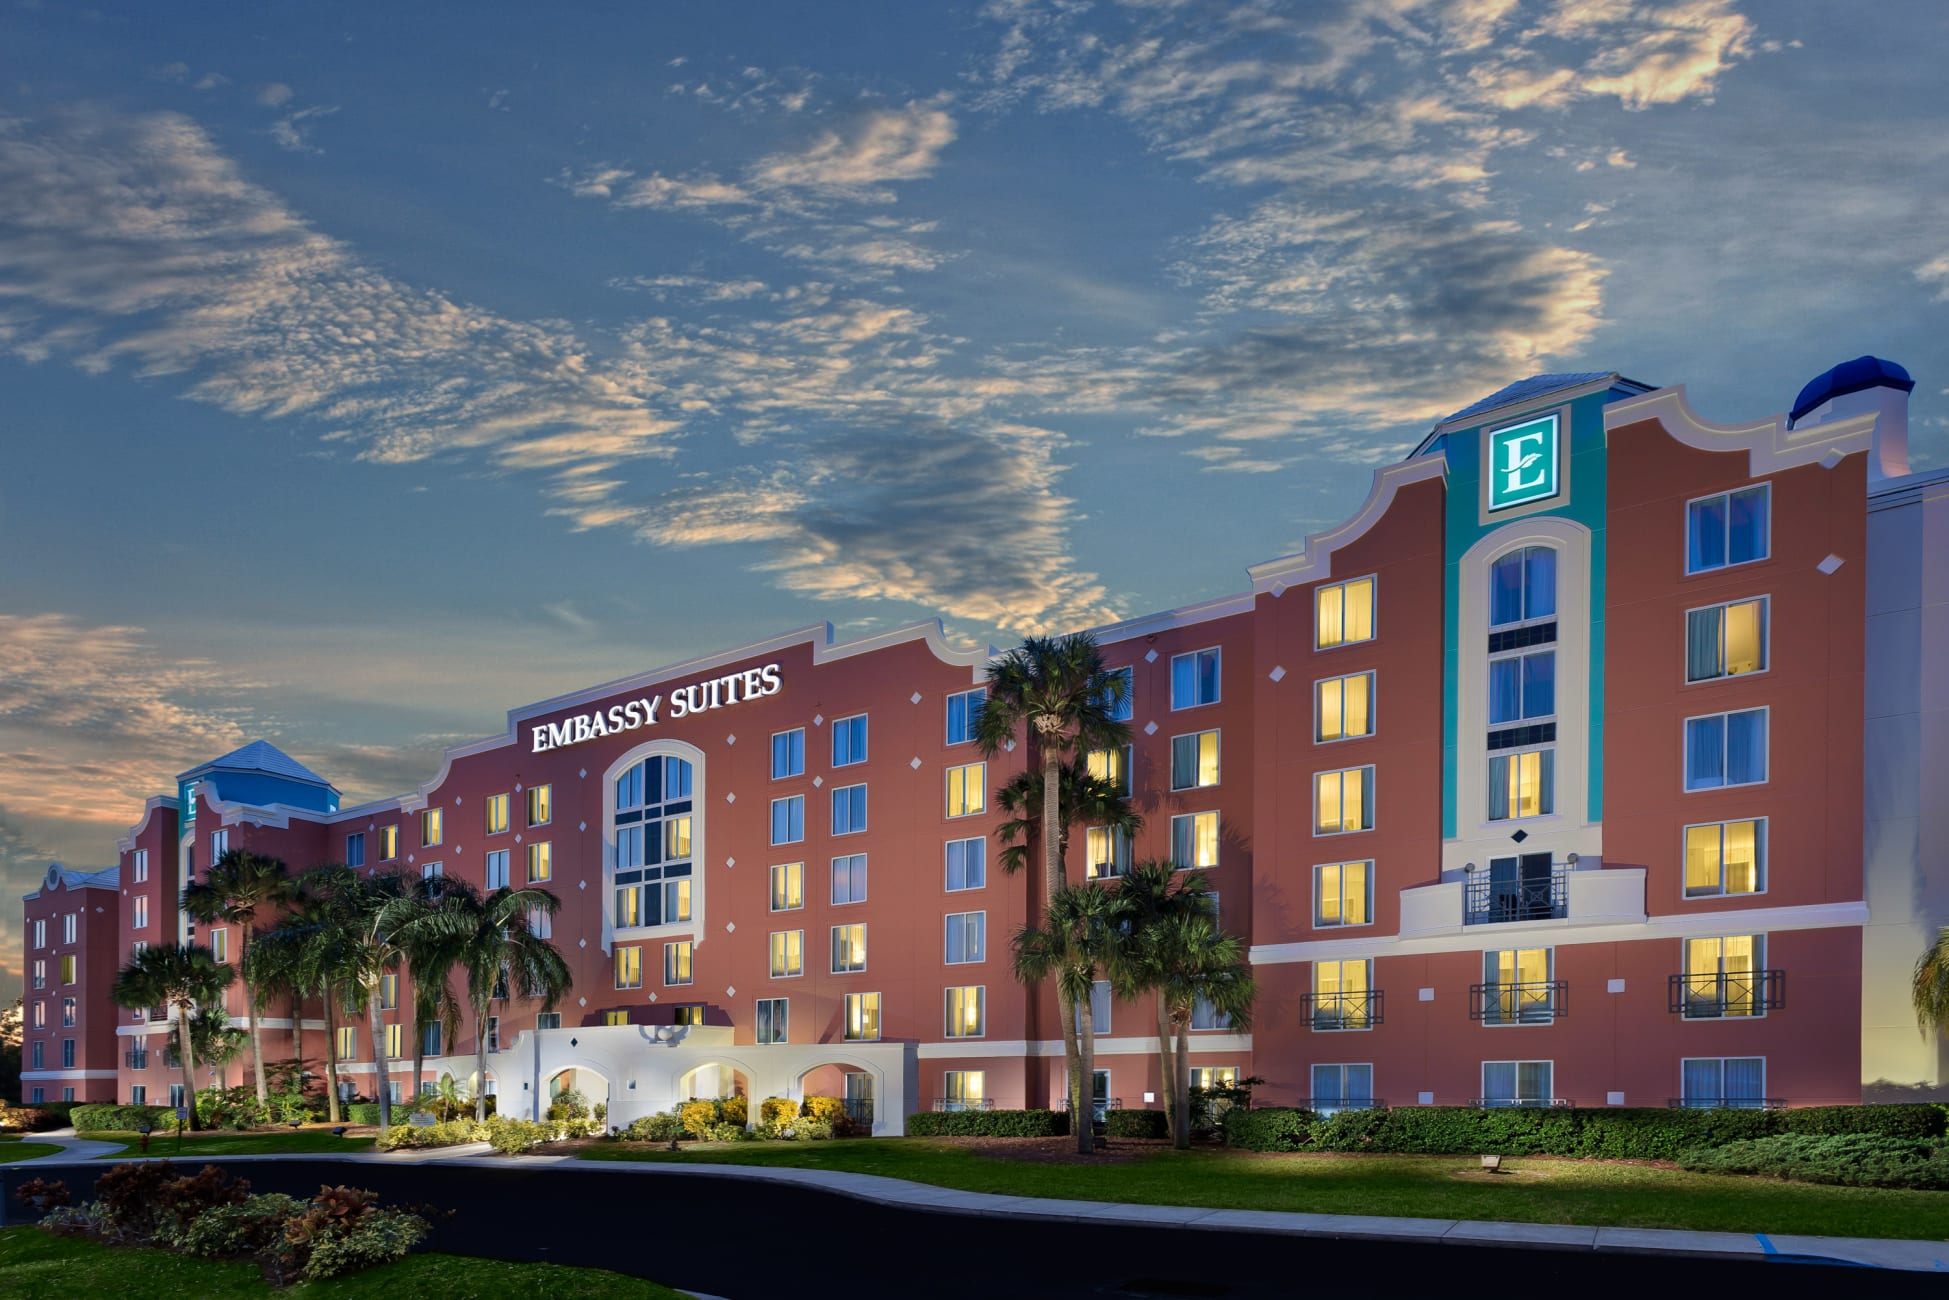 Resort Embassy Suiteshilton Orlando Lake Buena Vista Resort - Embassy Suites In Florida Map